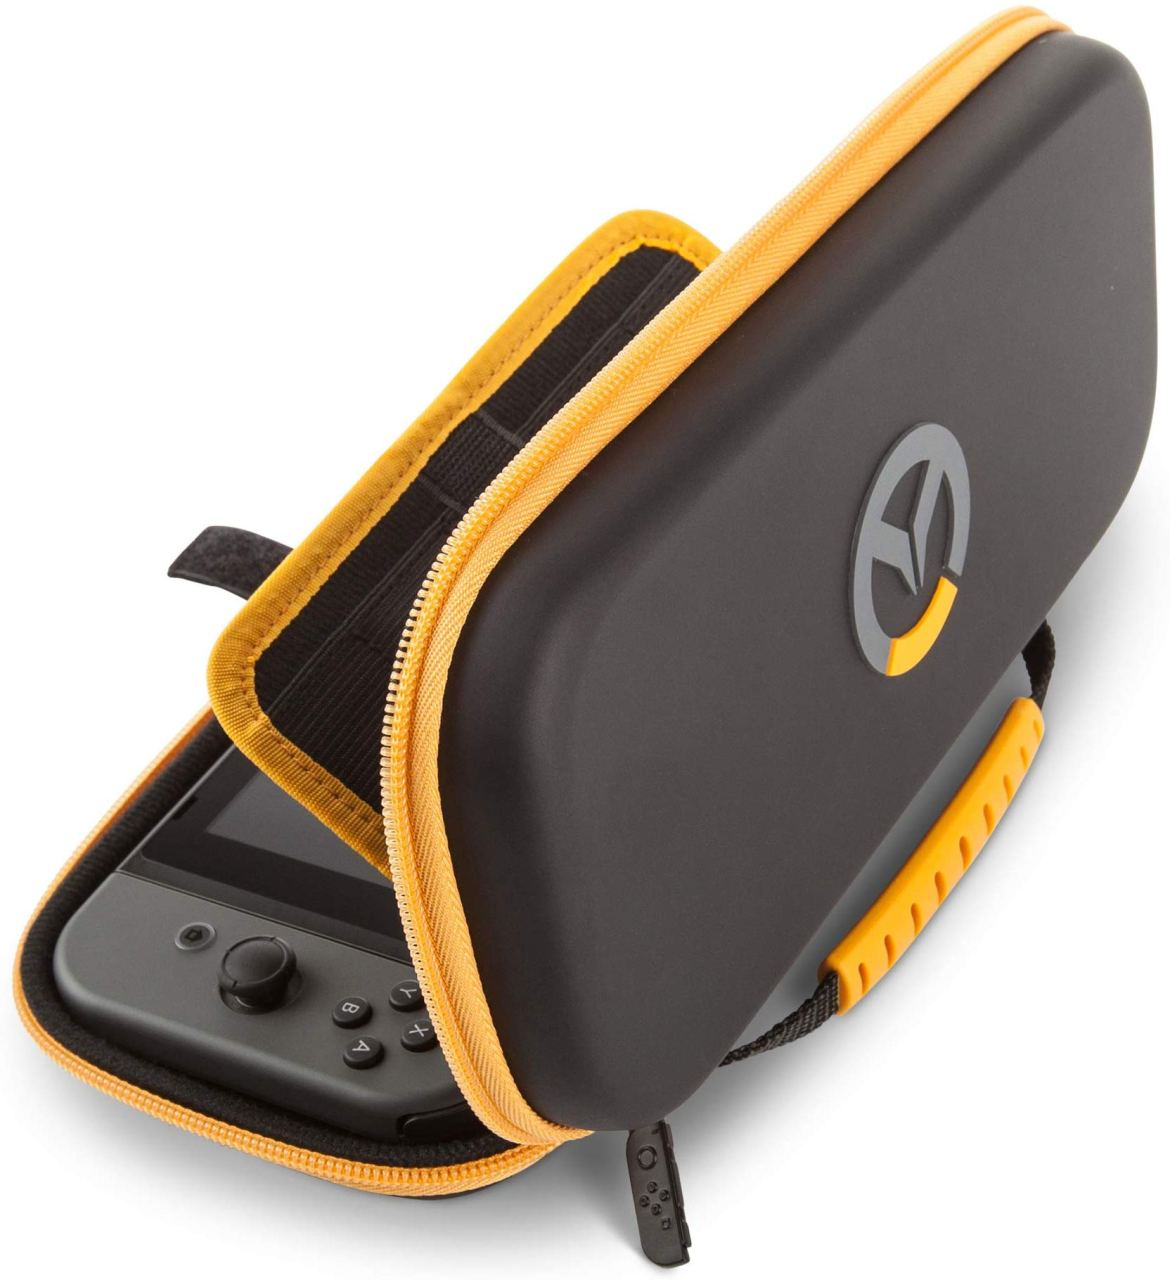 PowerA Overwatch Nintendo Switch Case Photo 3